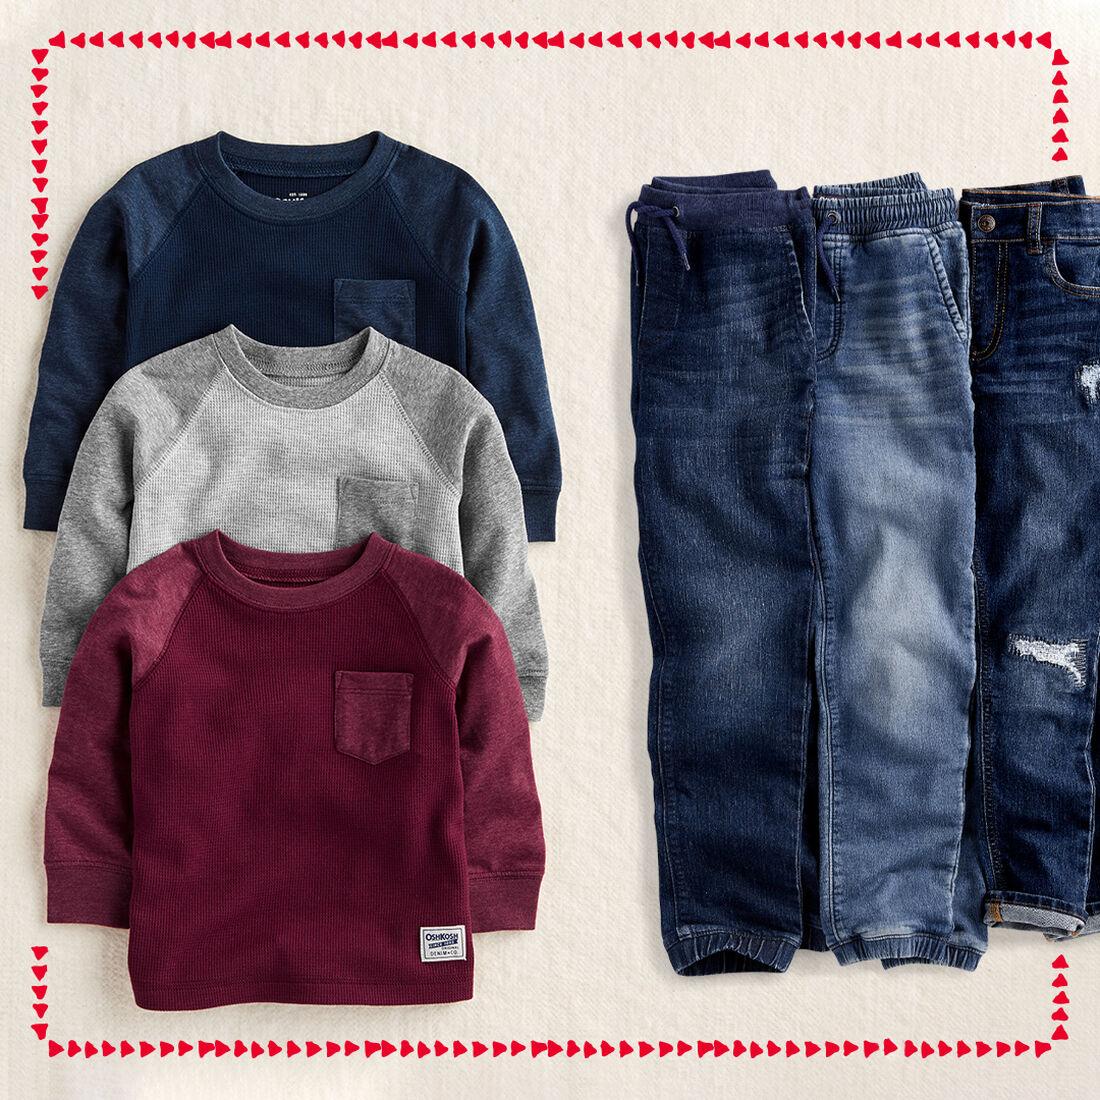 OKB_OCT20_Jeans_Pullovers, , hi-res